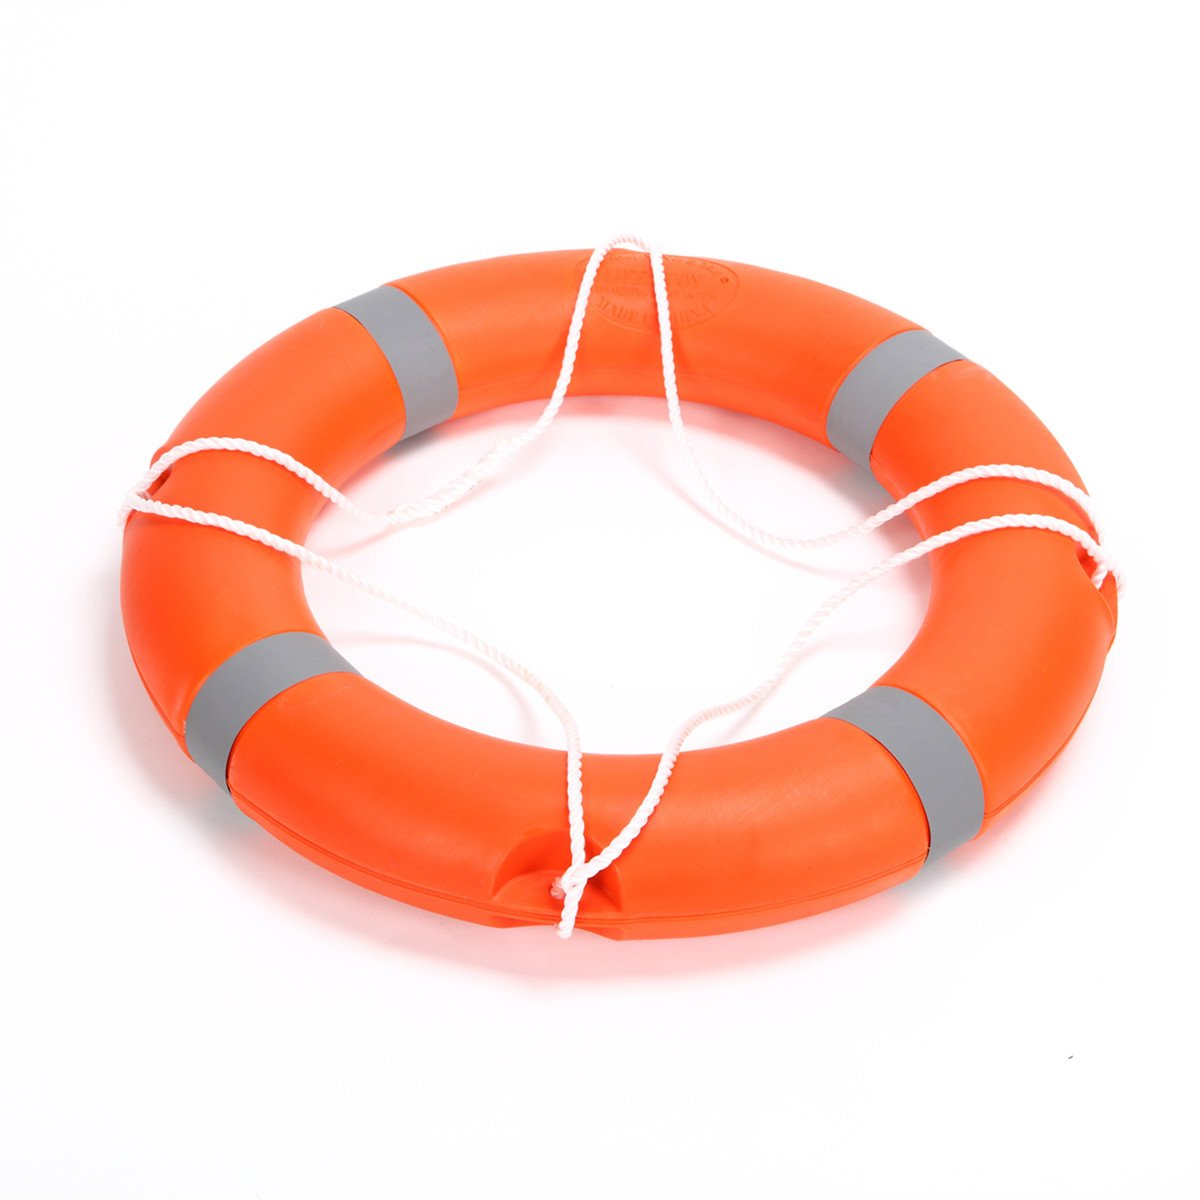 BeautySu. 28'' Diameter Professional Adult Foam Swim Ring Buoy Orange Lifering with White Bands by BeautySu. (Image #4)